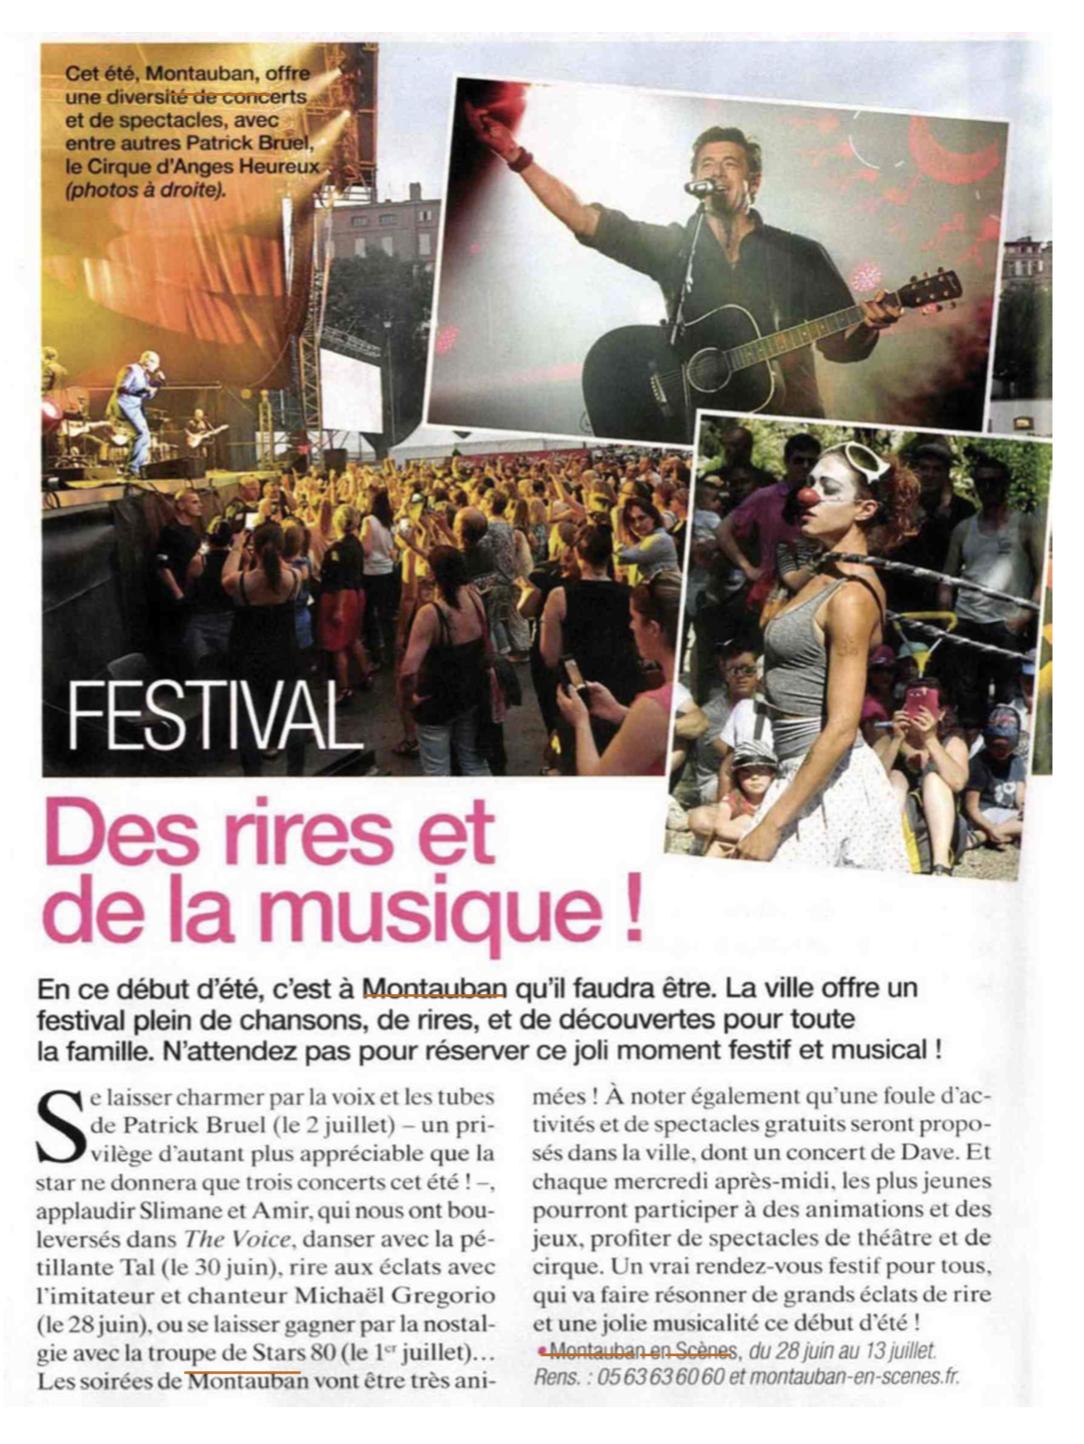 Montauban en Scènes - Maxi - Agence La Cerise